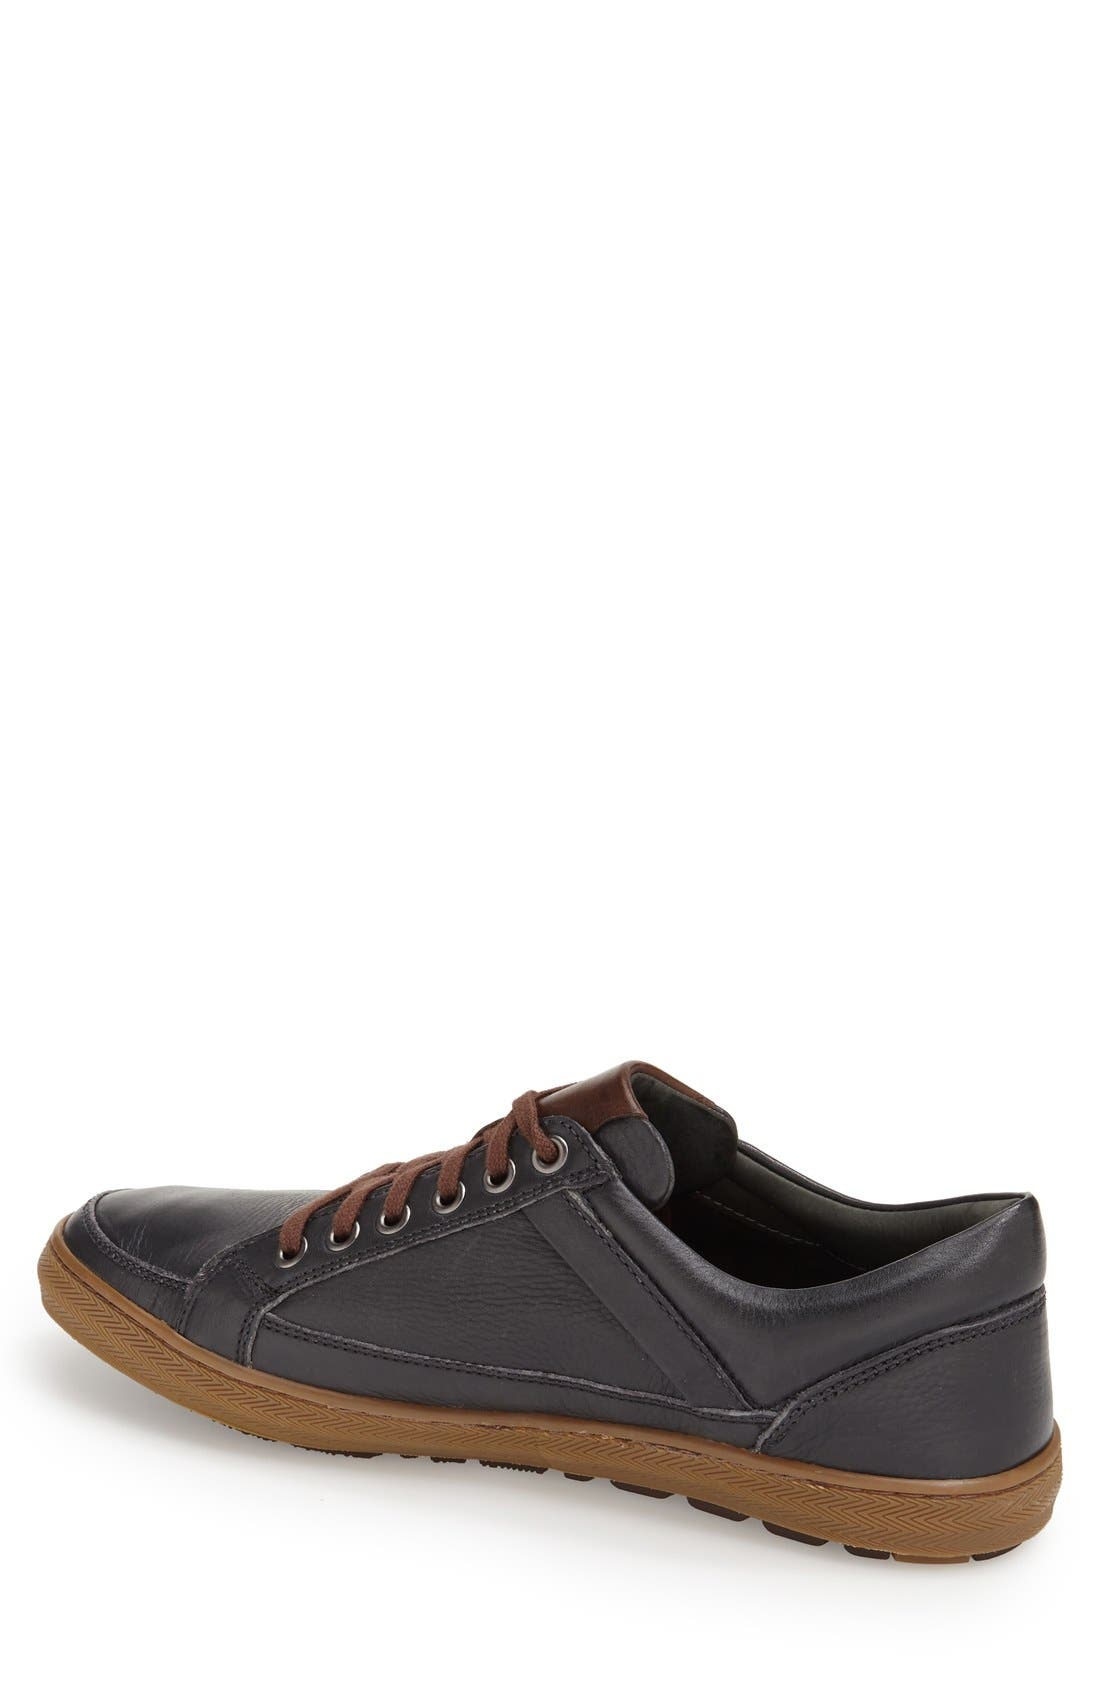 Serra Sneaker,                             Alternate thumbnail 2, color,                             001